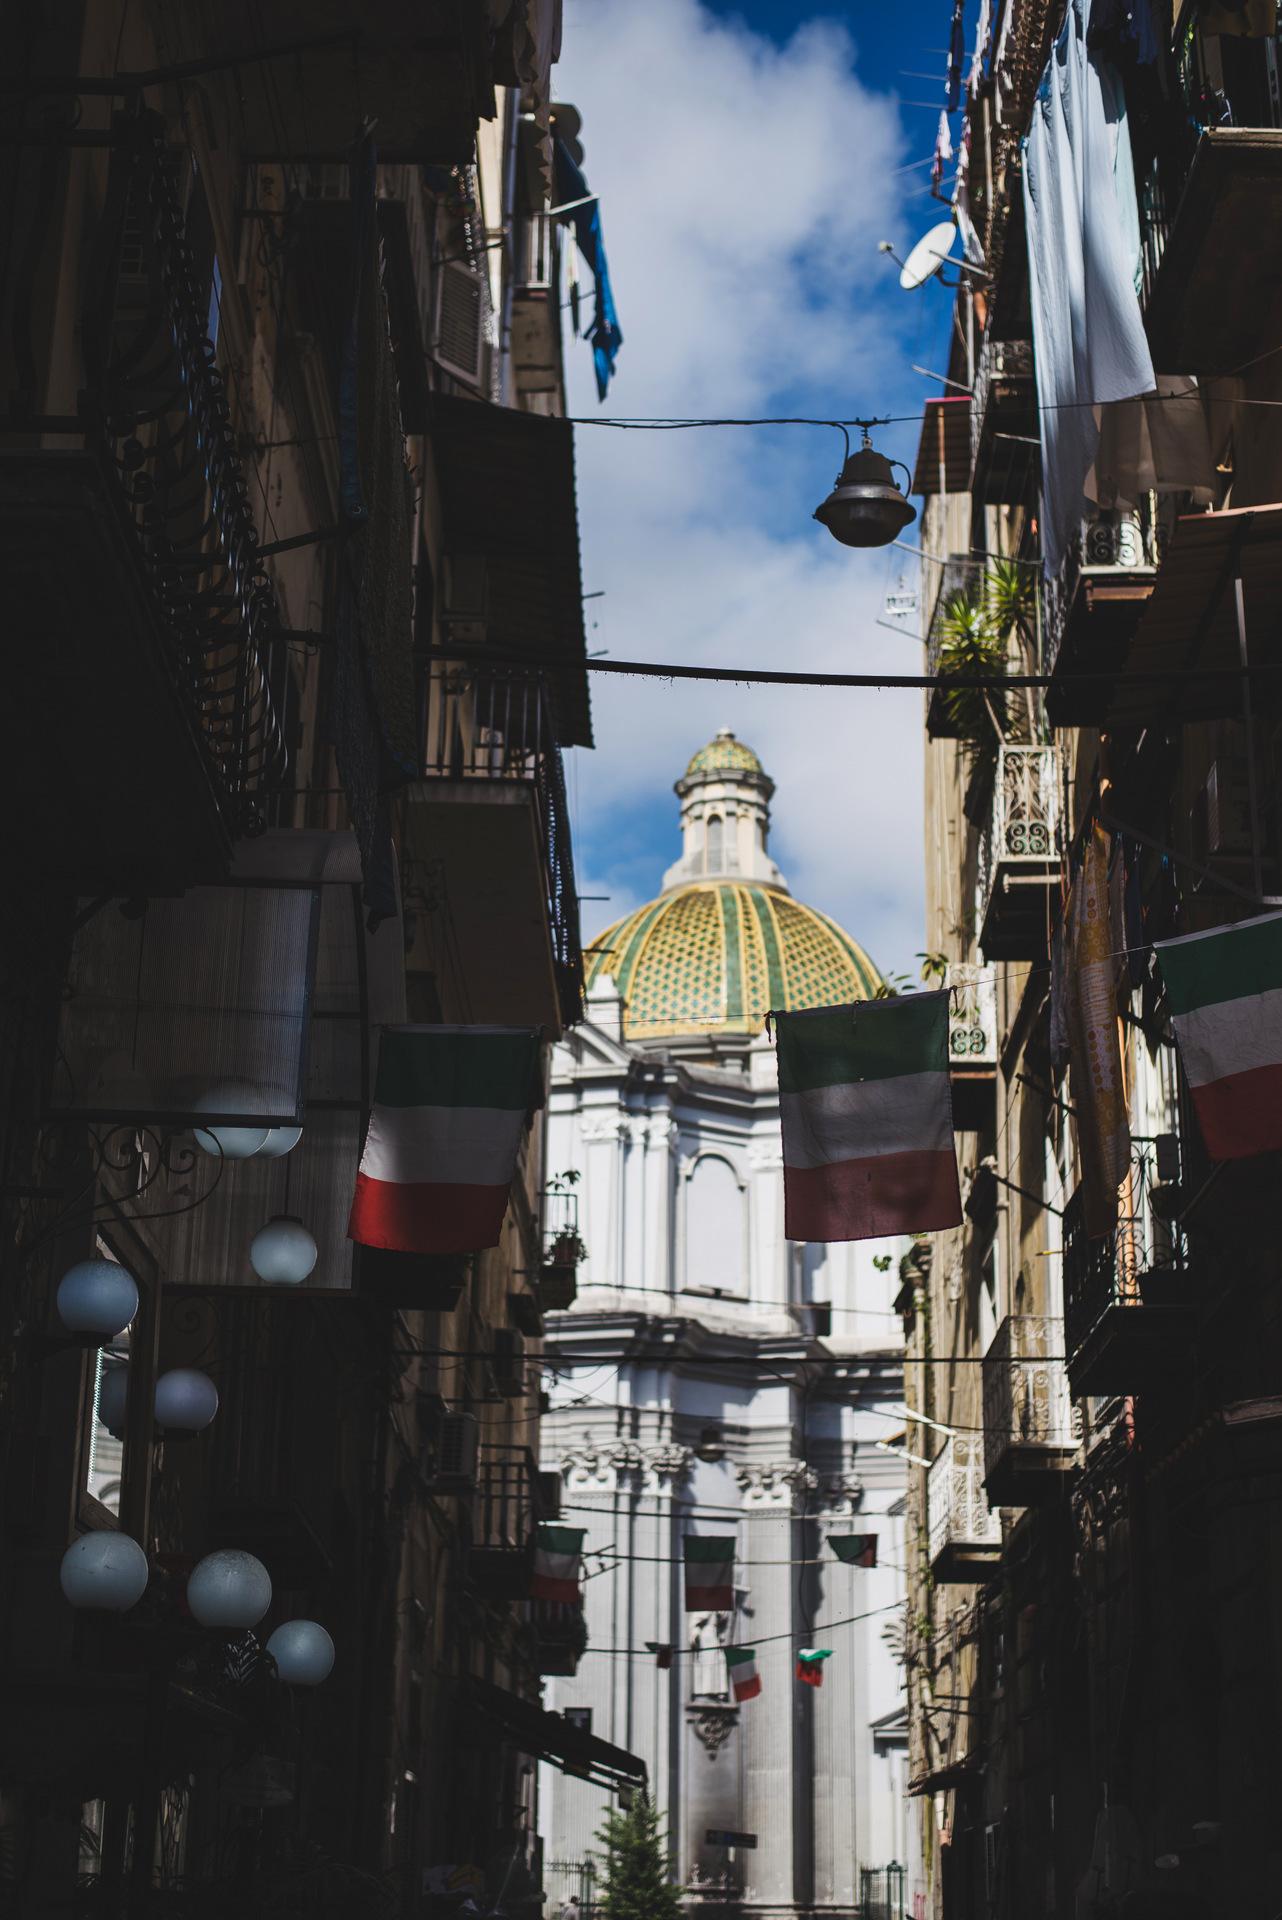 neapol ulice